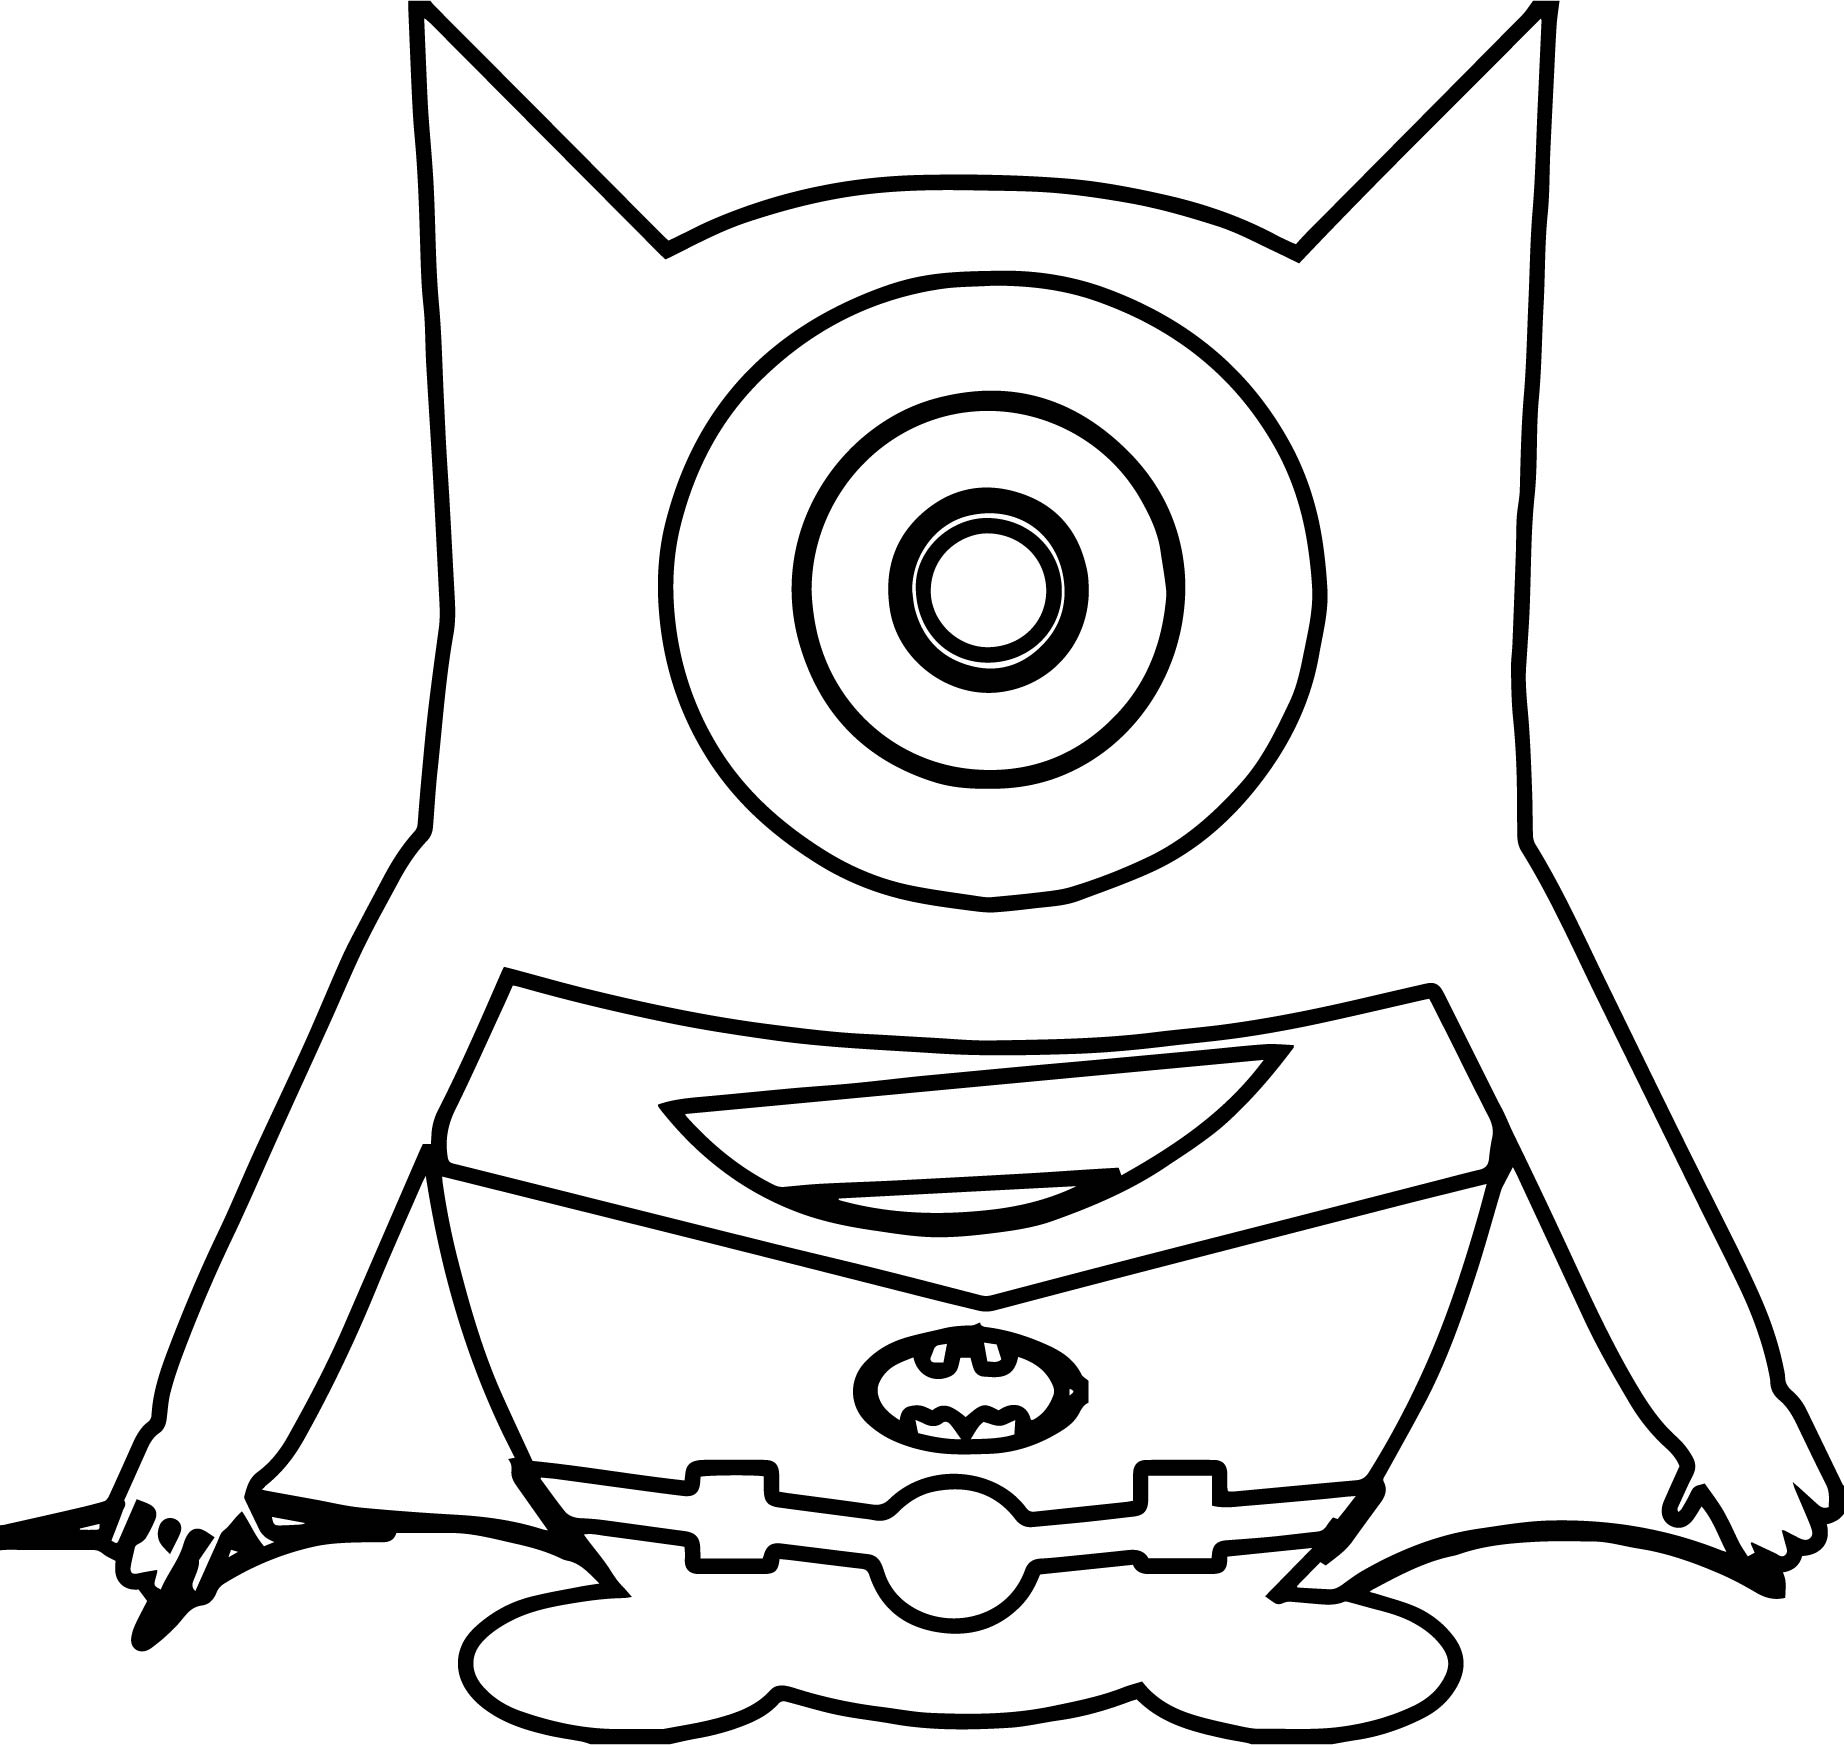 1844x1745 Batman Minion Outline Coloring Page Wecoloringpage